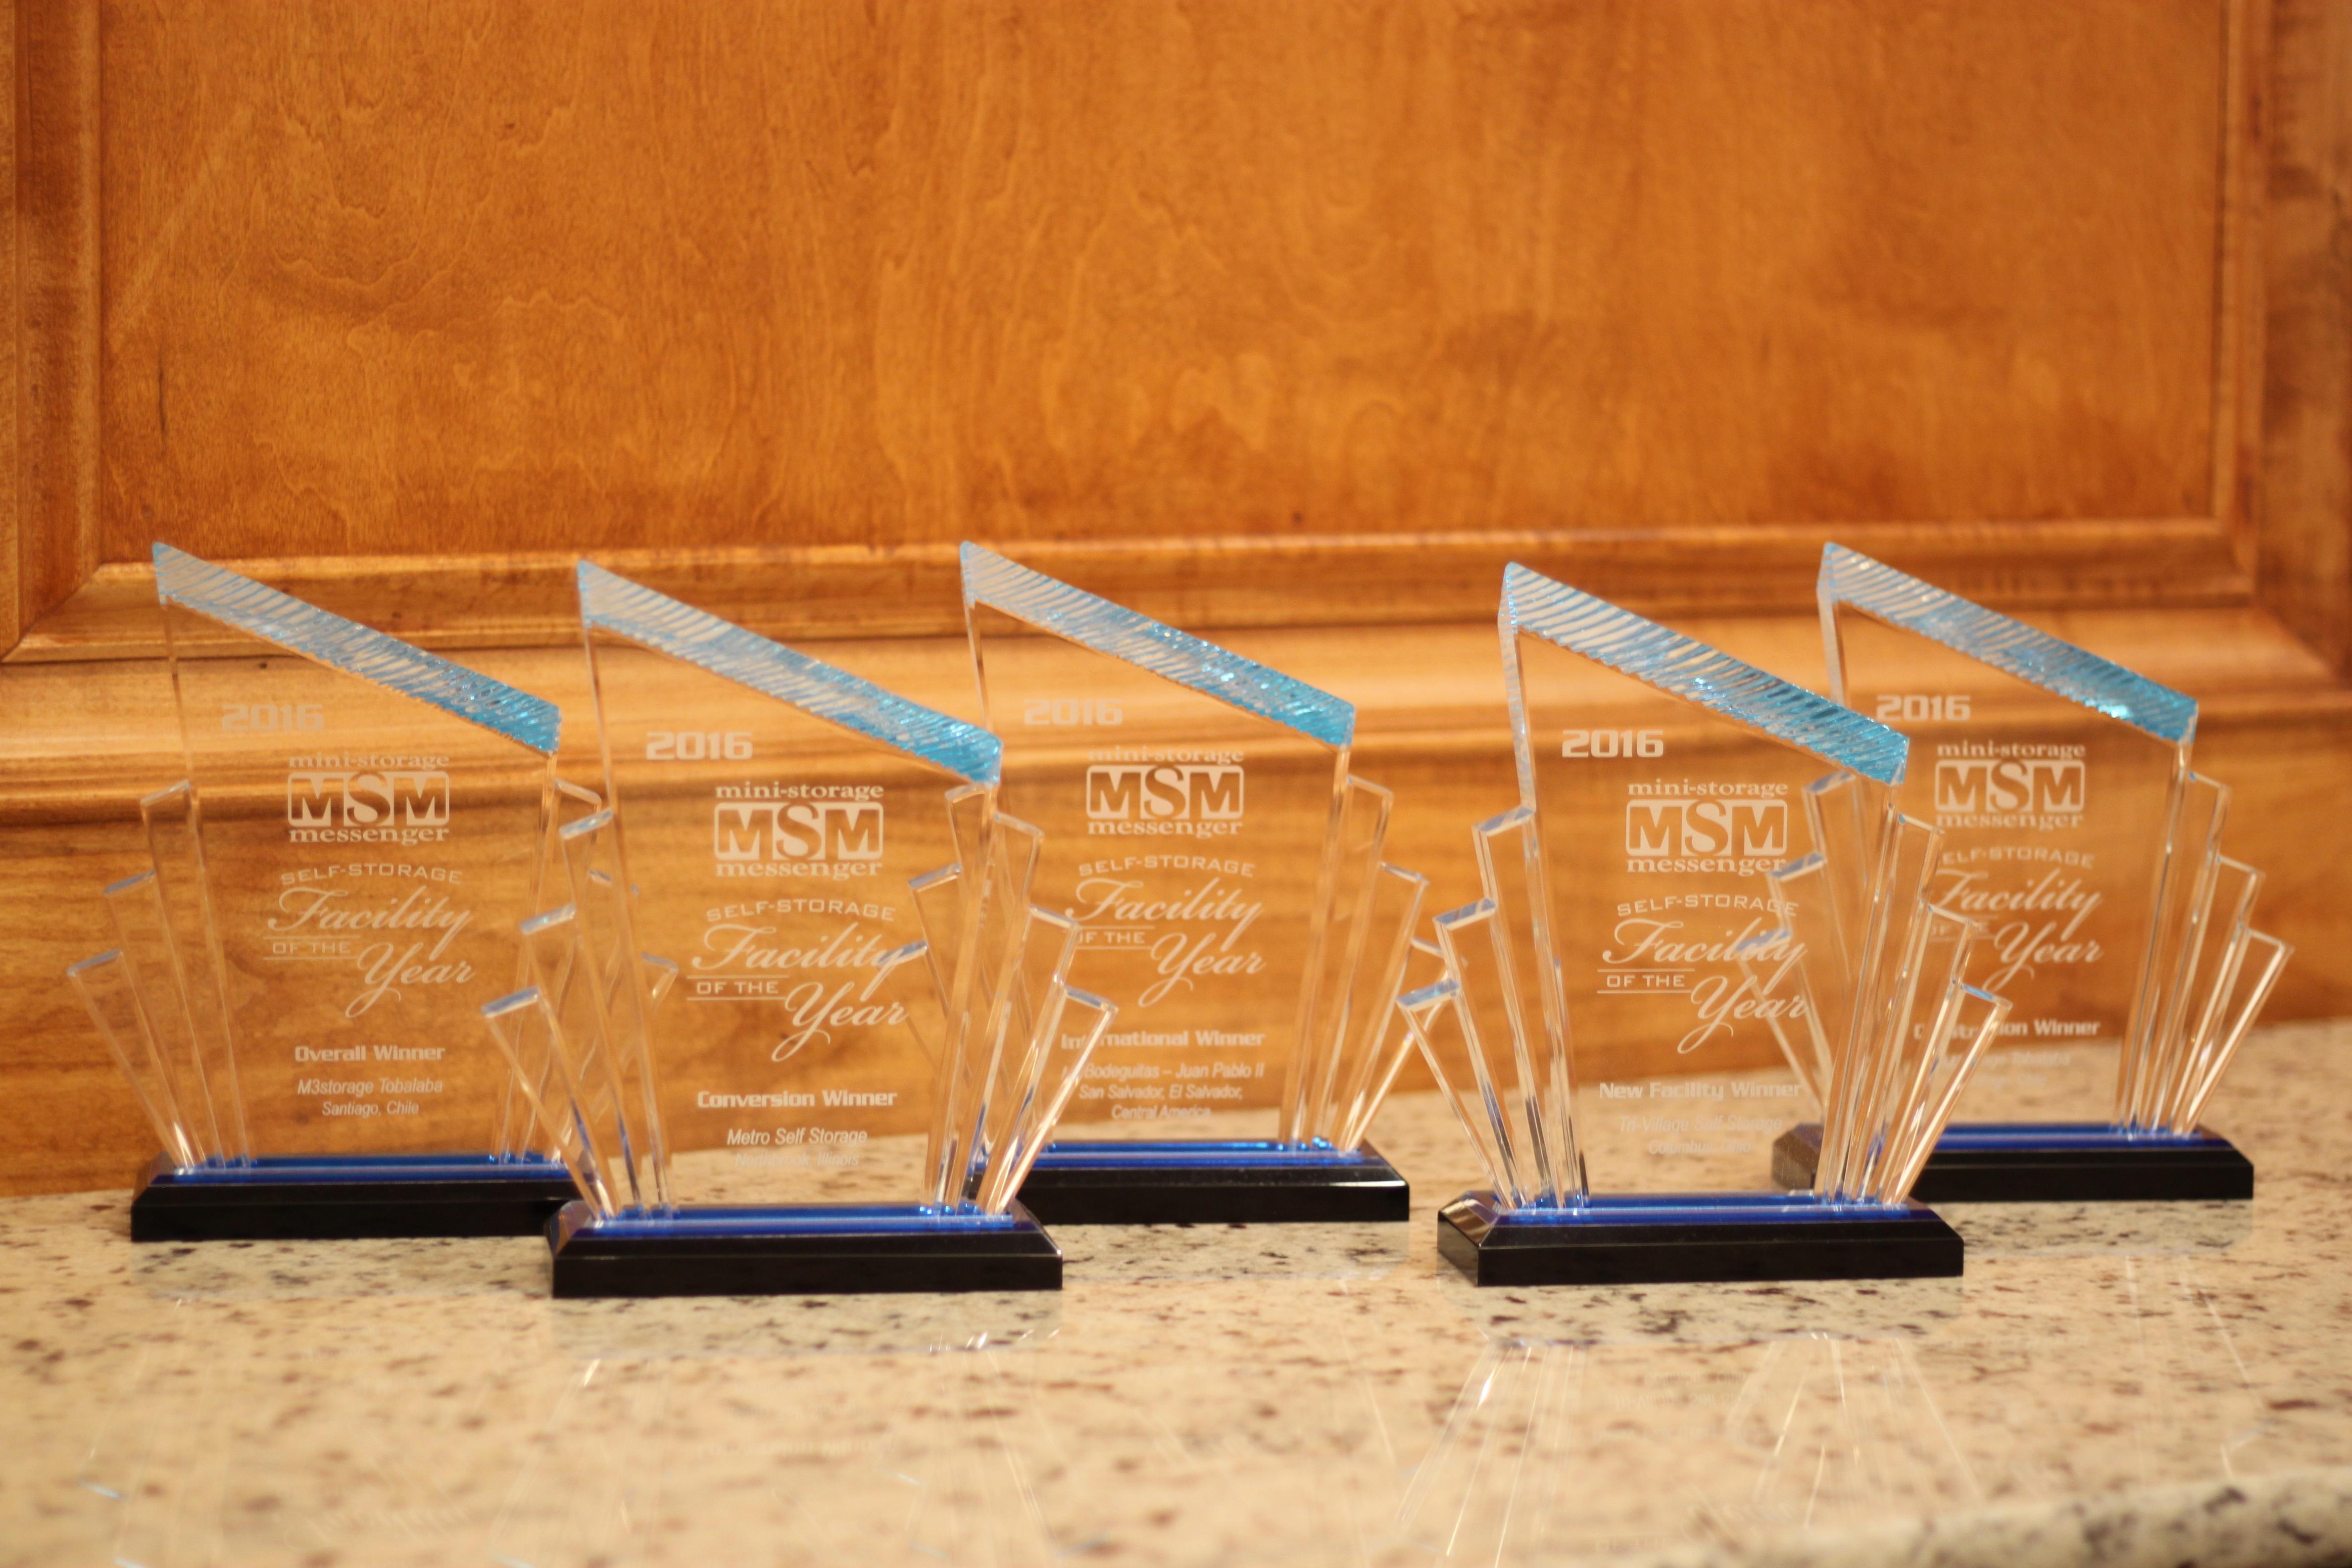 Mini Storage Messenger glass awards